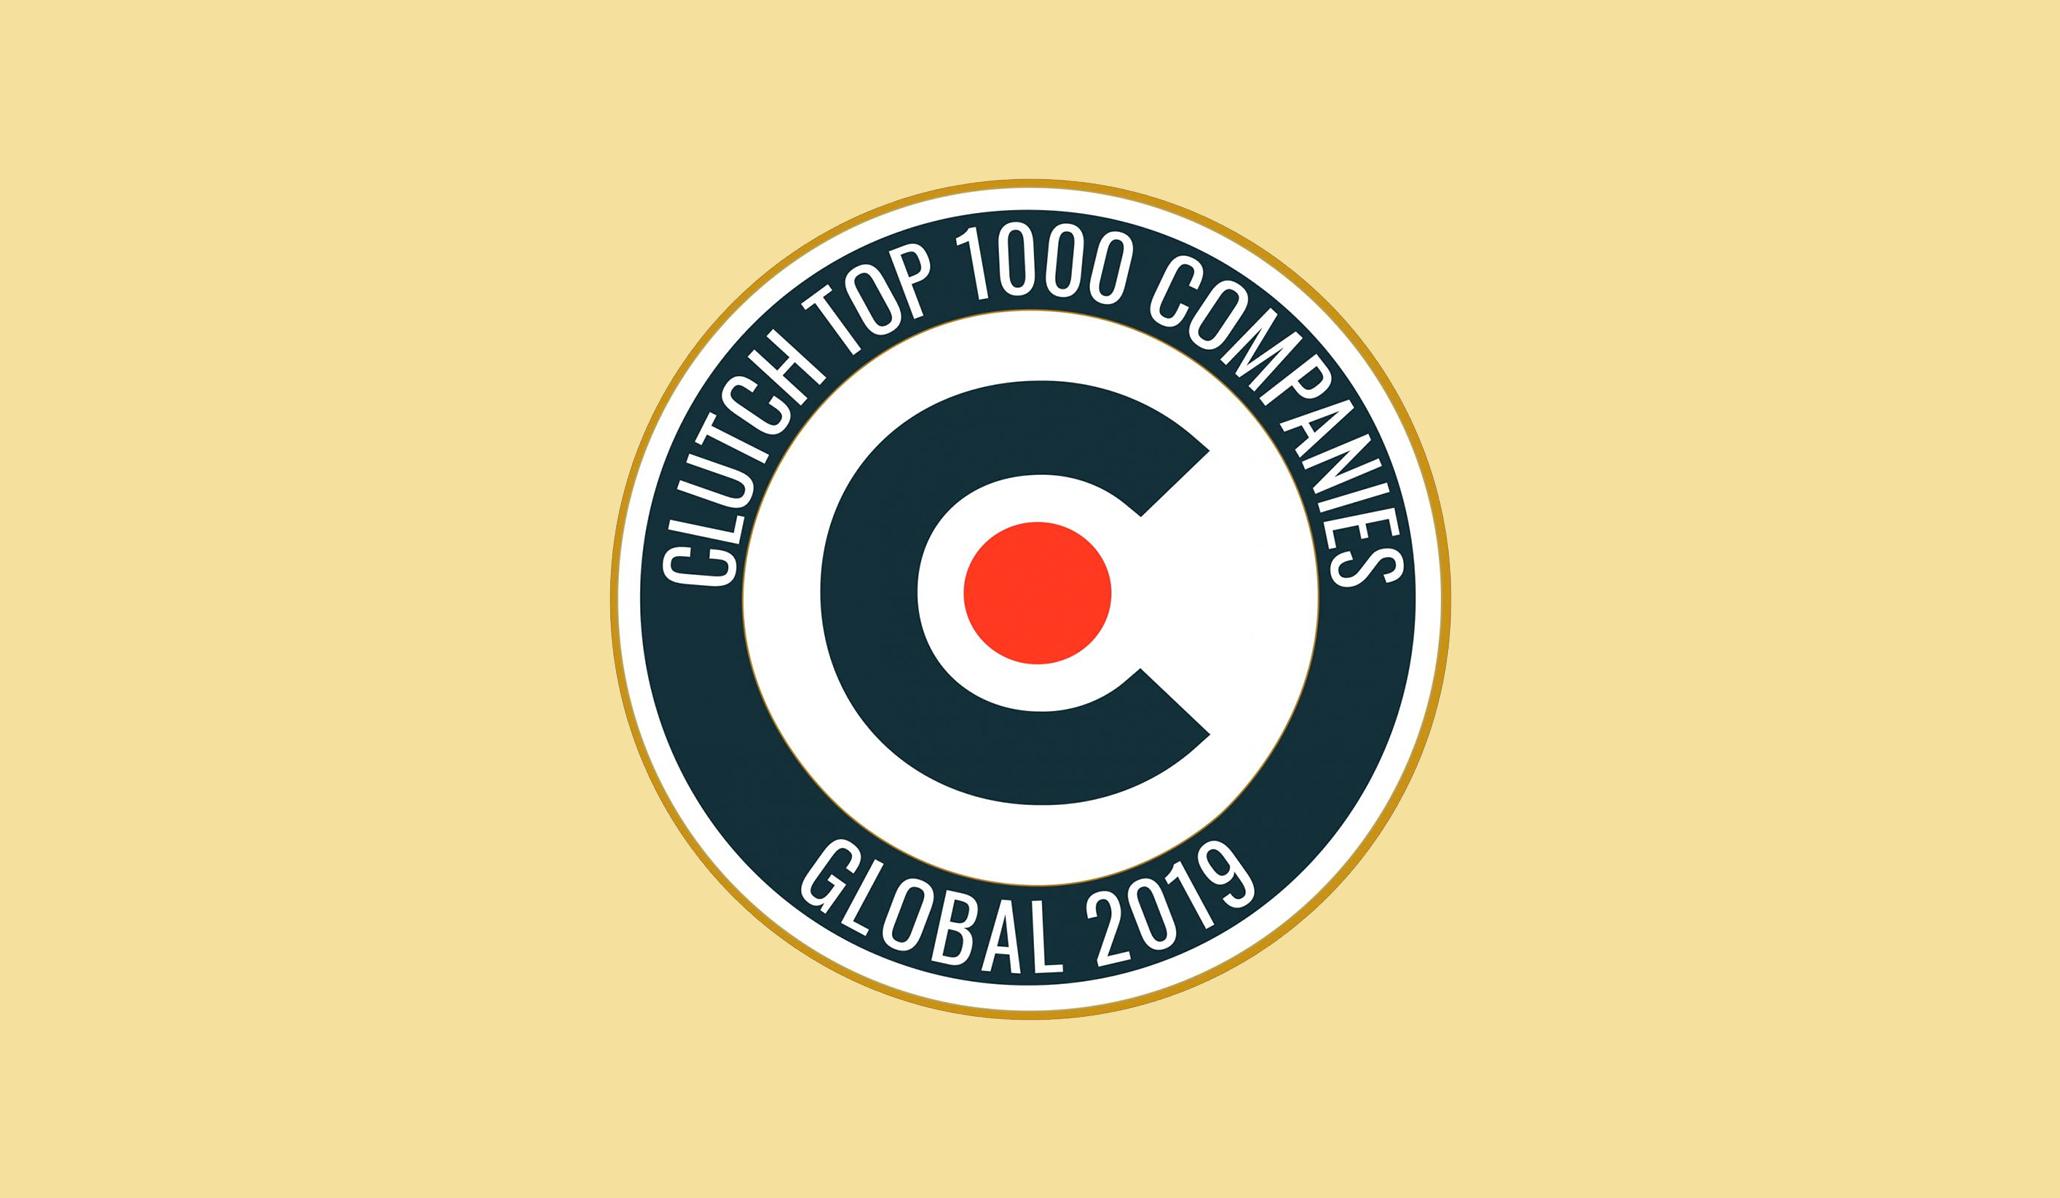 Multidots Named a Top Global B2B Company